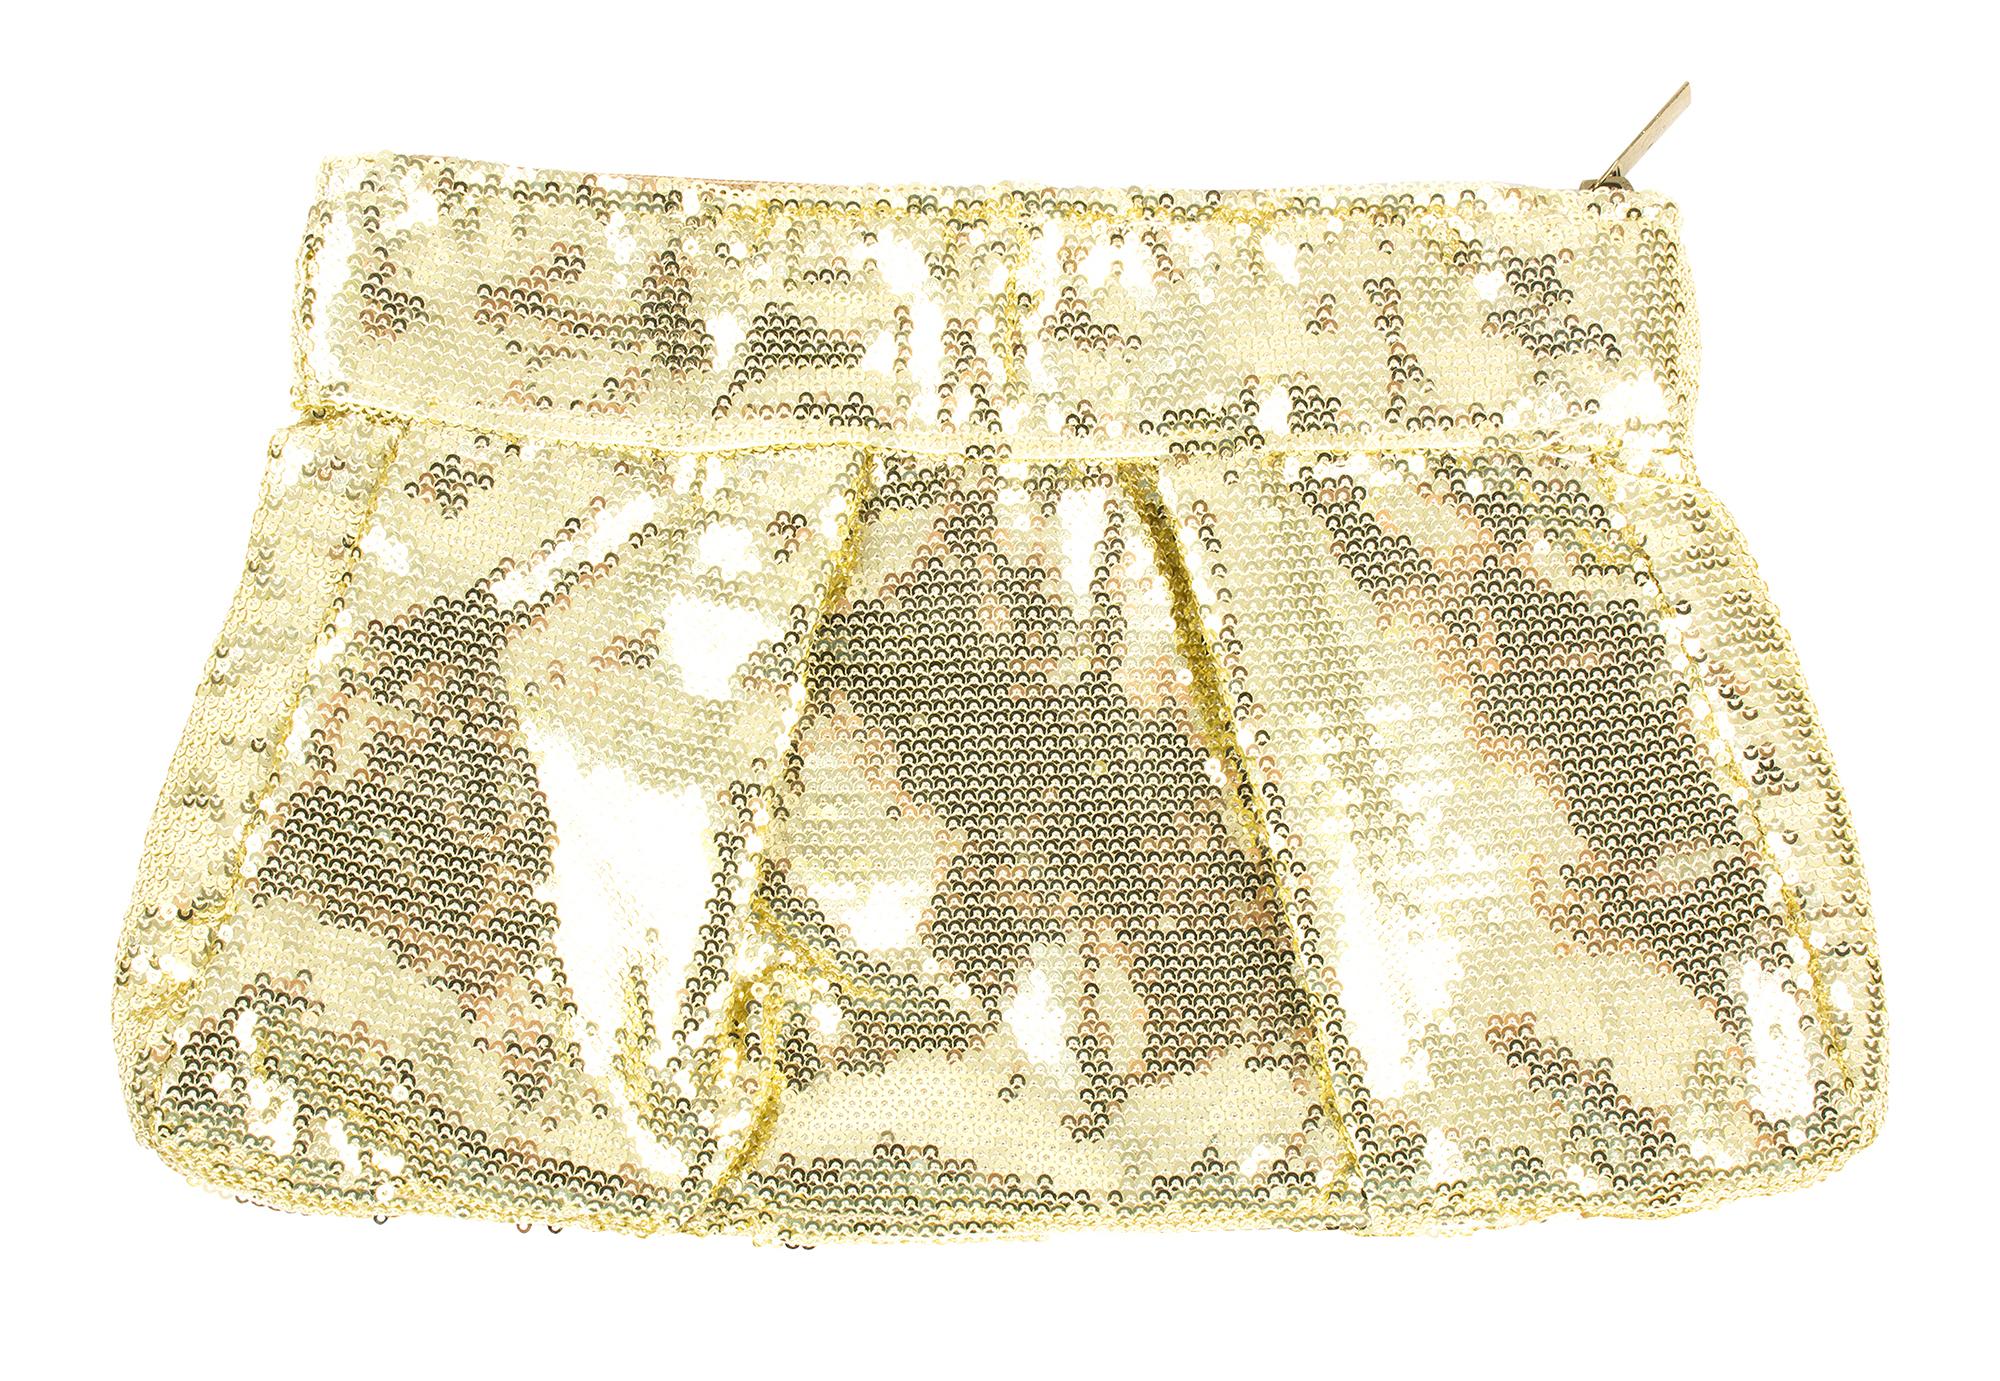 Muche et Muchette gold sequin clutch, $50 at Copper Penny